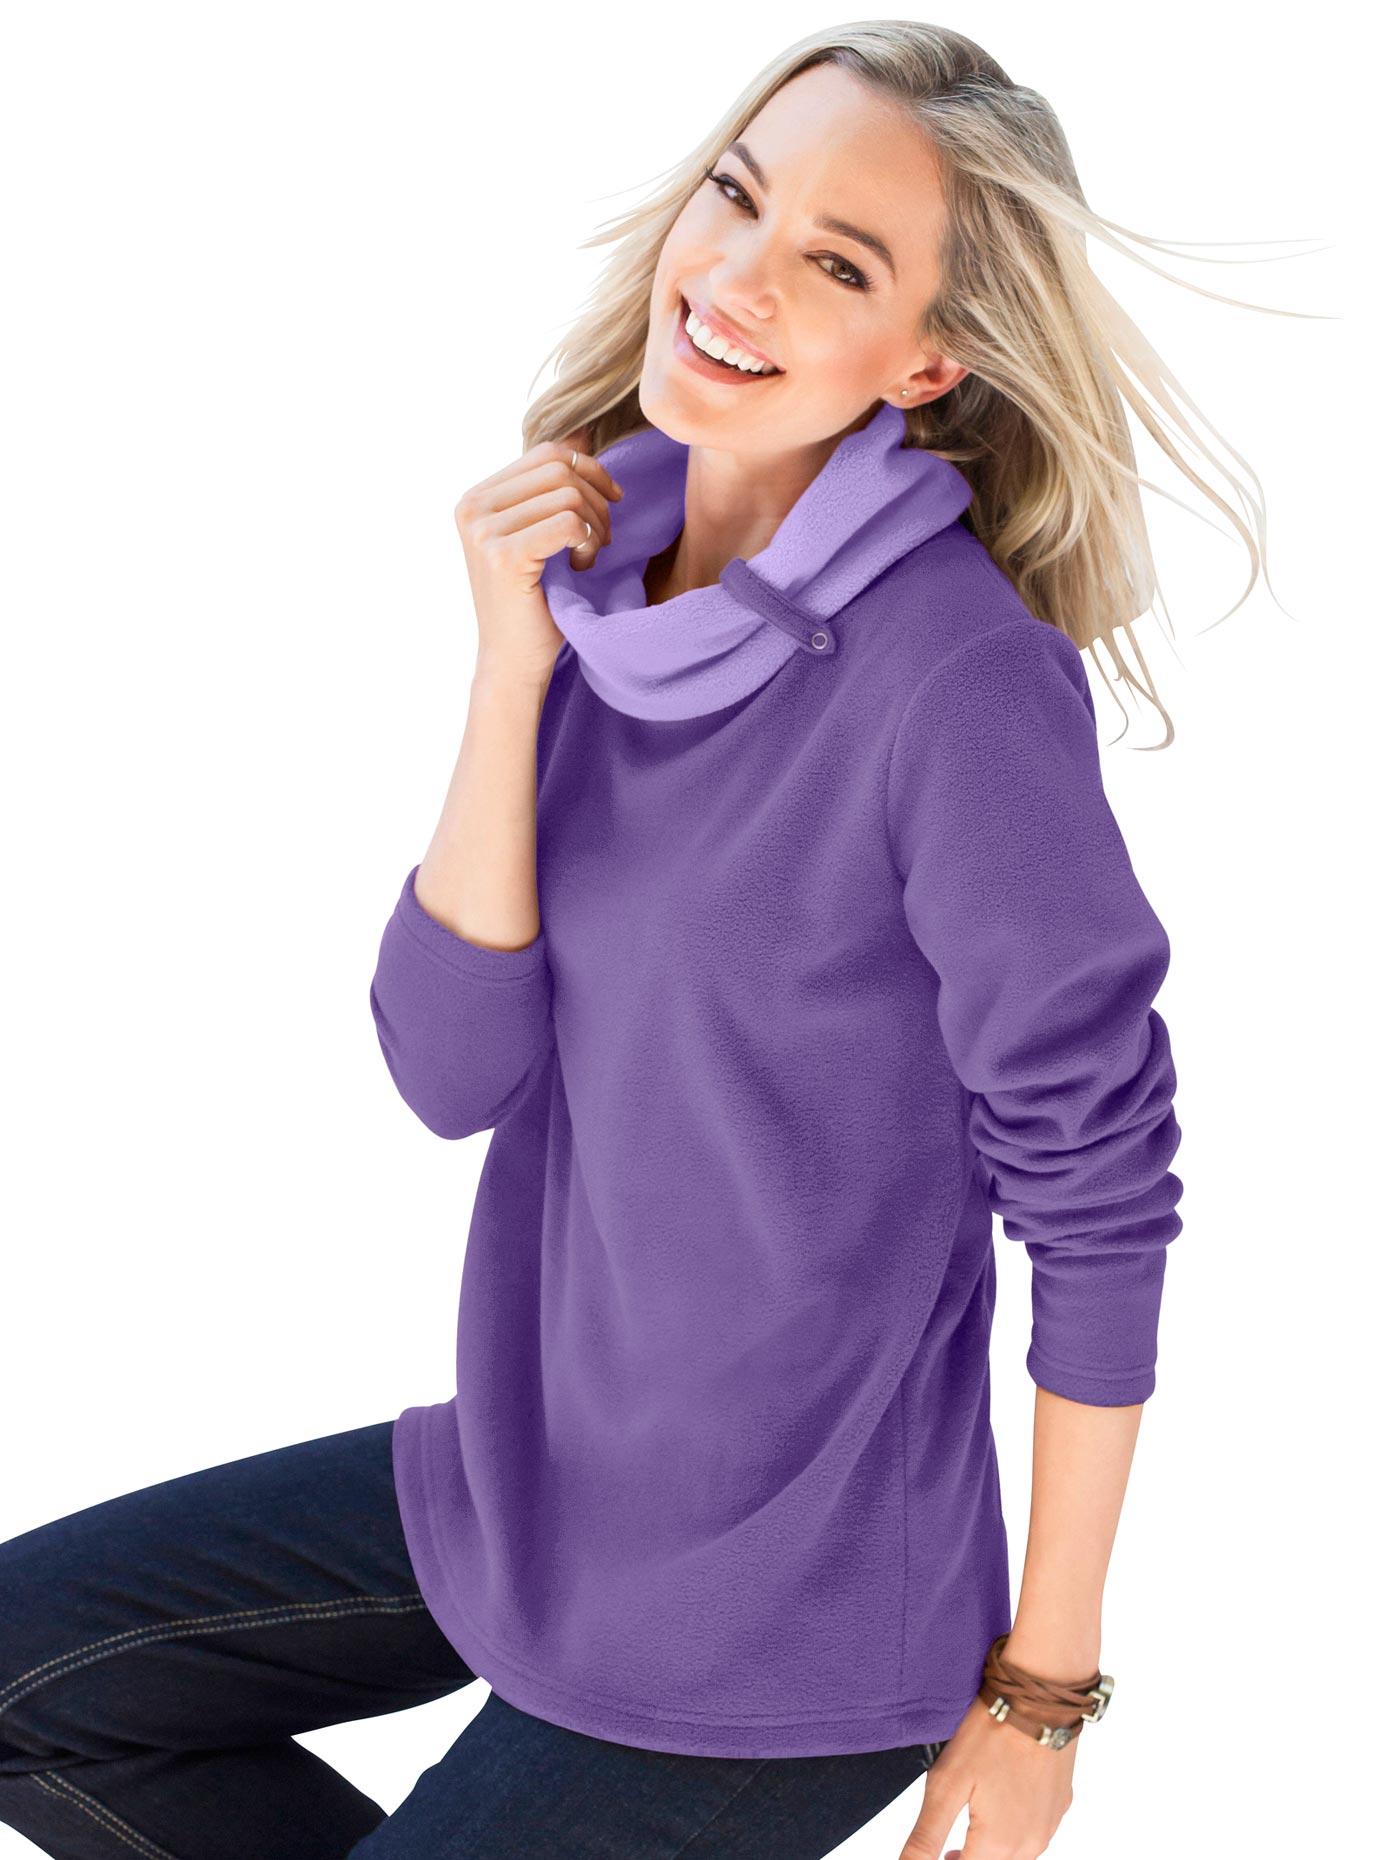 Classic Basics Fleece-Shirt mit doppellagigem Rollkragen | Bekleidung > Sweatshirts & -jacken > Fleeceshirts | Lila | Classic Basics